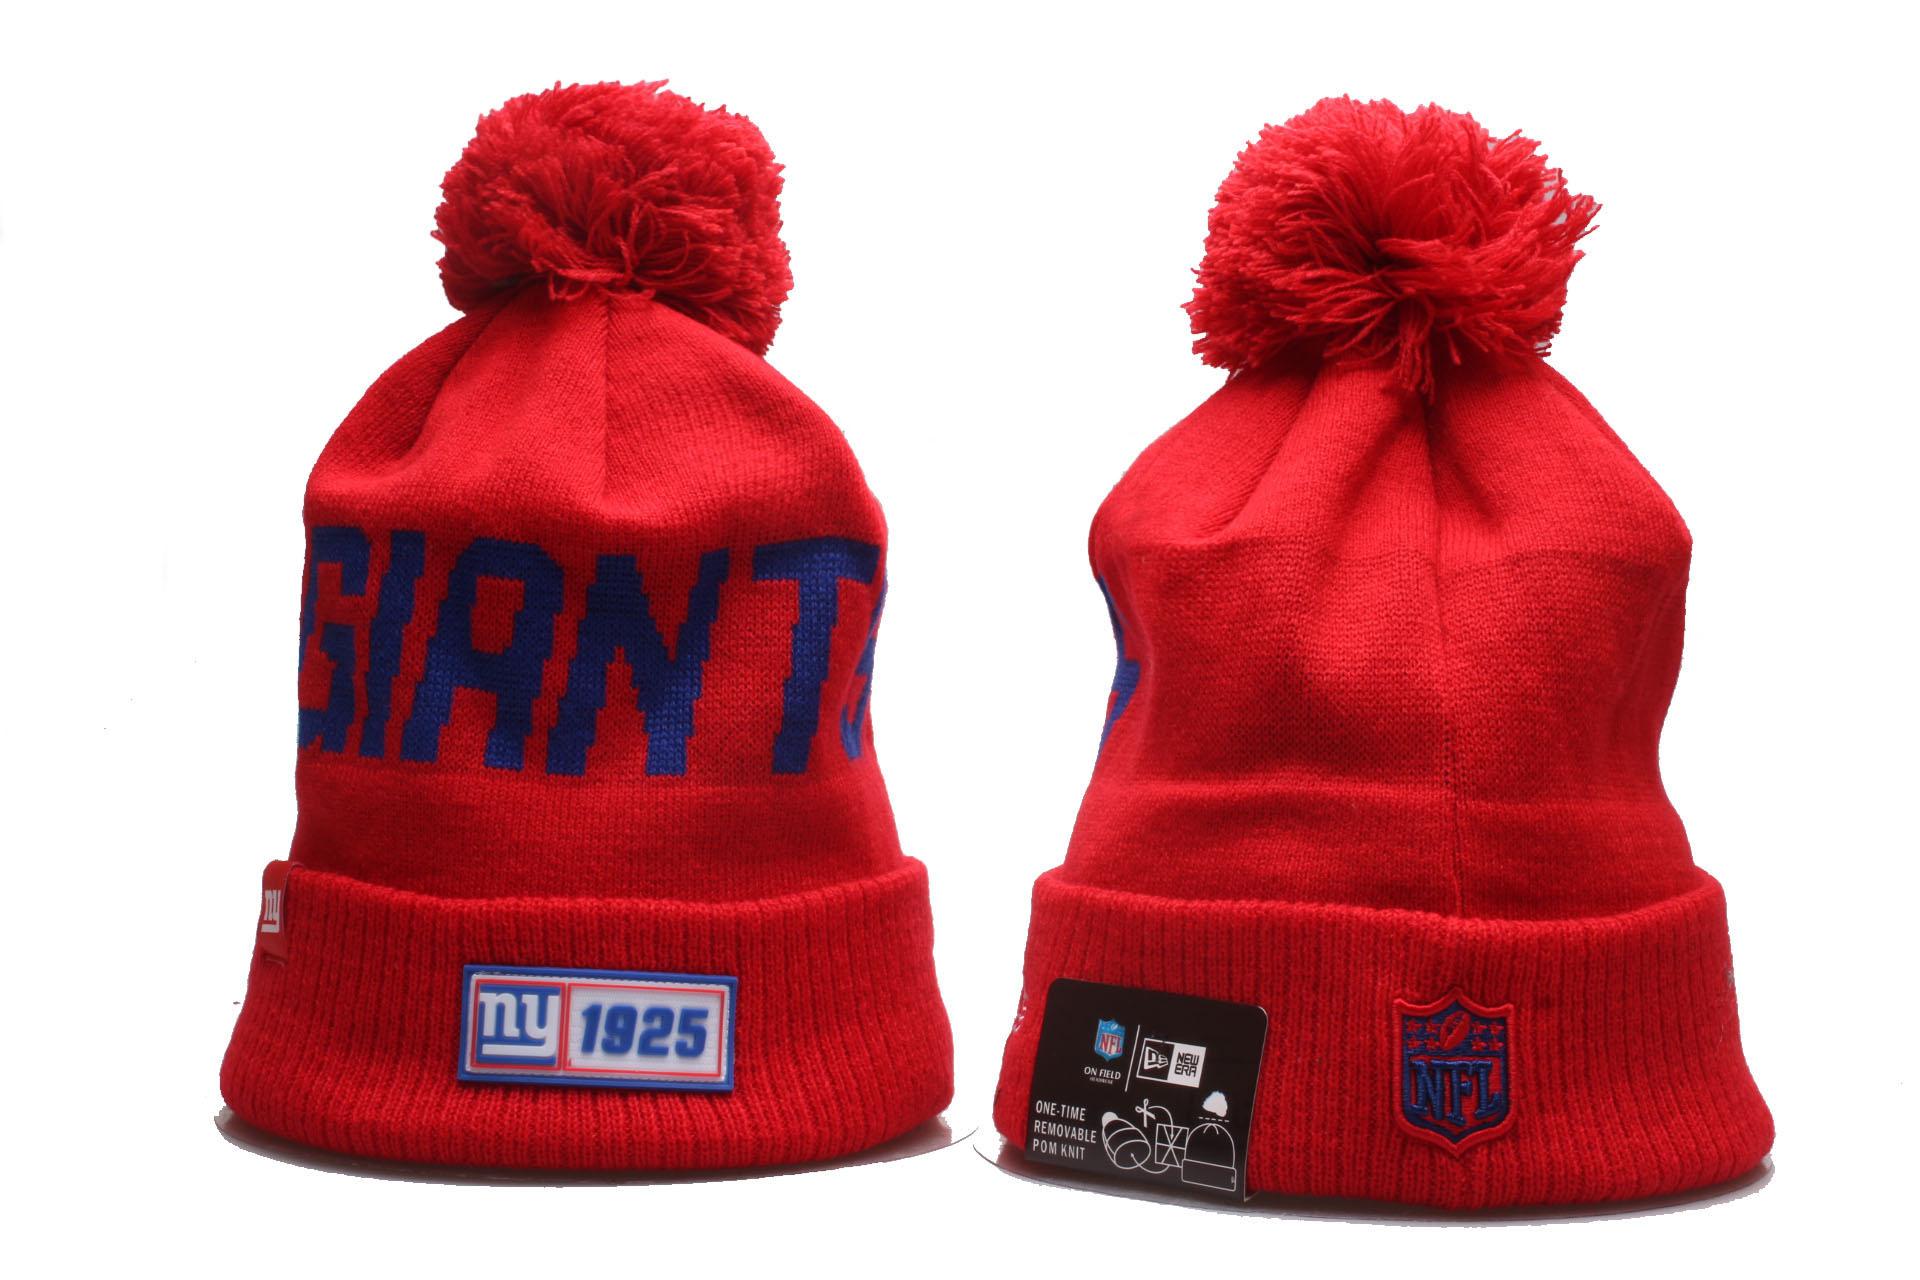 New York Giants Team Logo Red Cuffed Pom Knit Hat YP